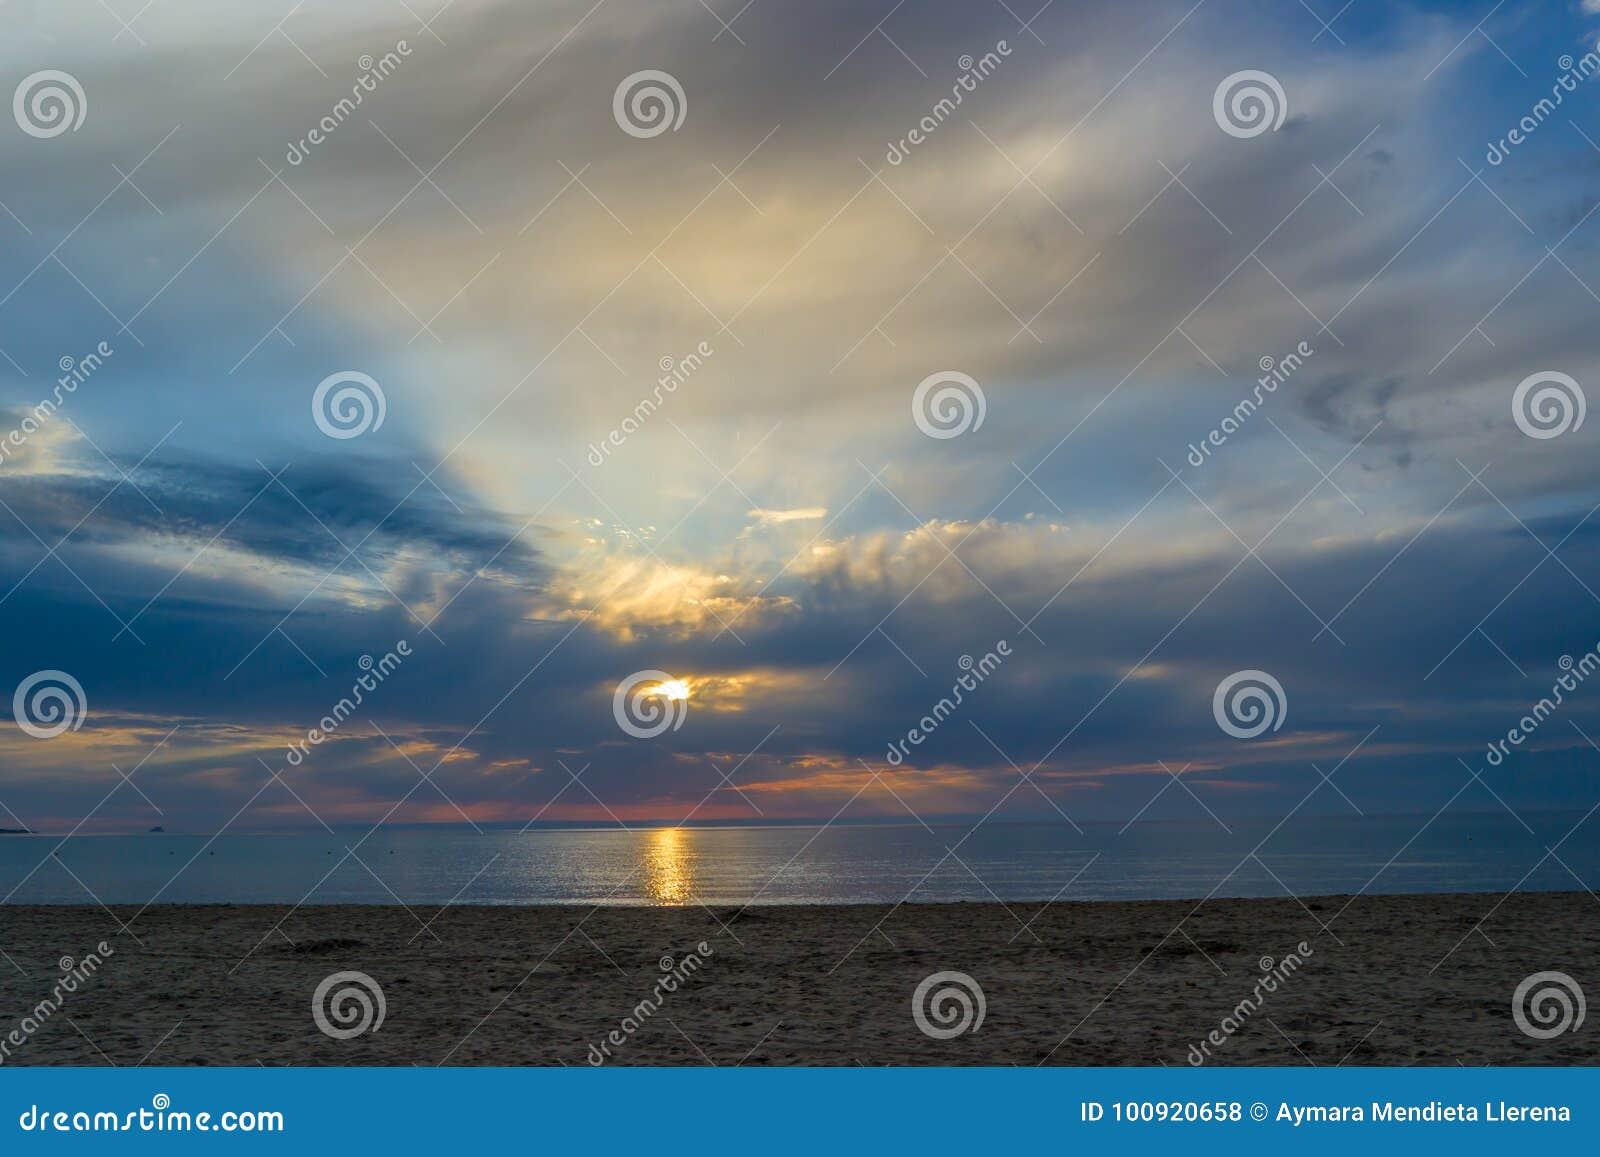 La Cinta海滩,神的黎明,圣特奥多罗,撒丁岛,意大利